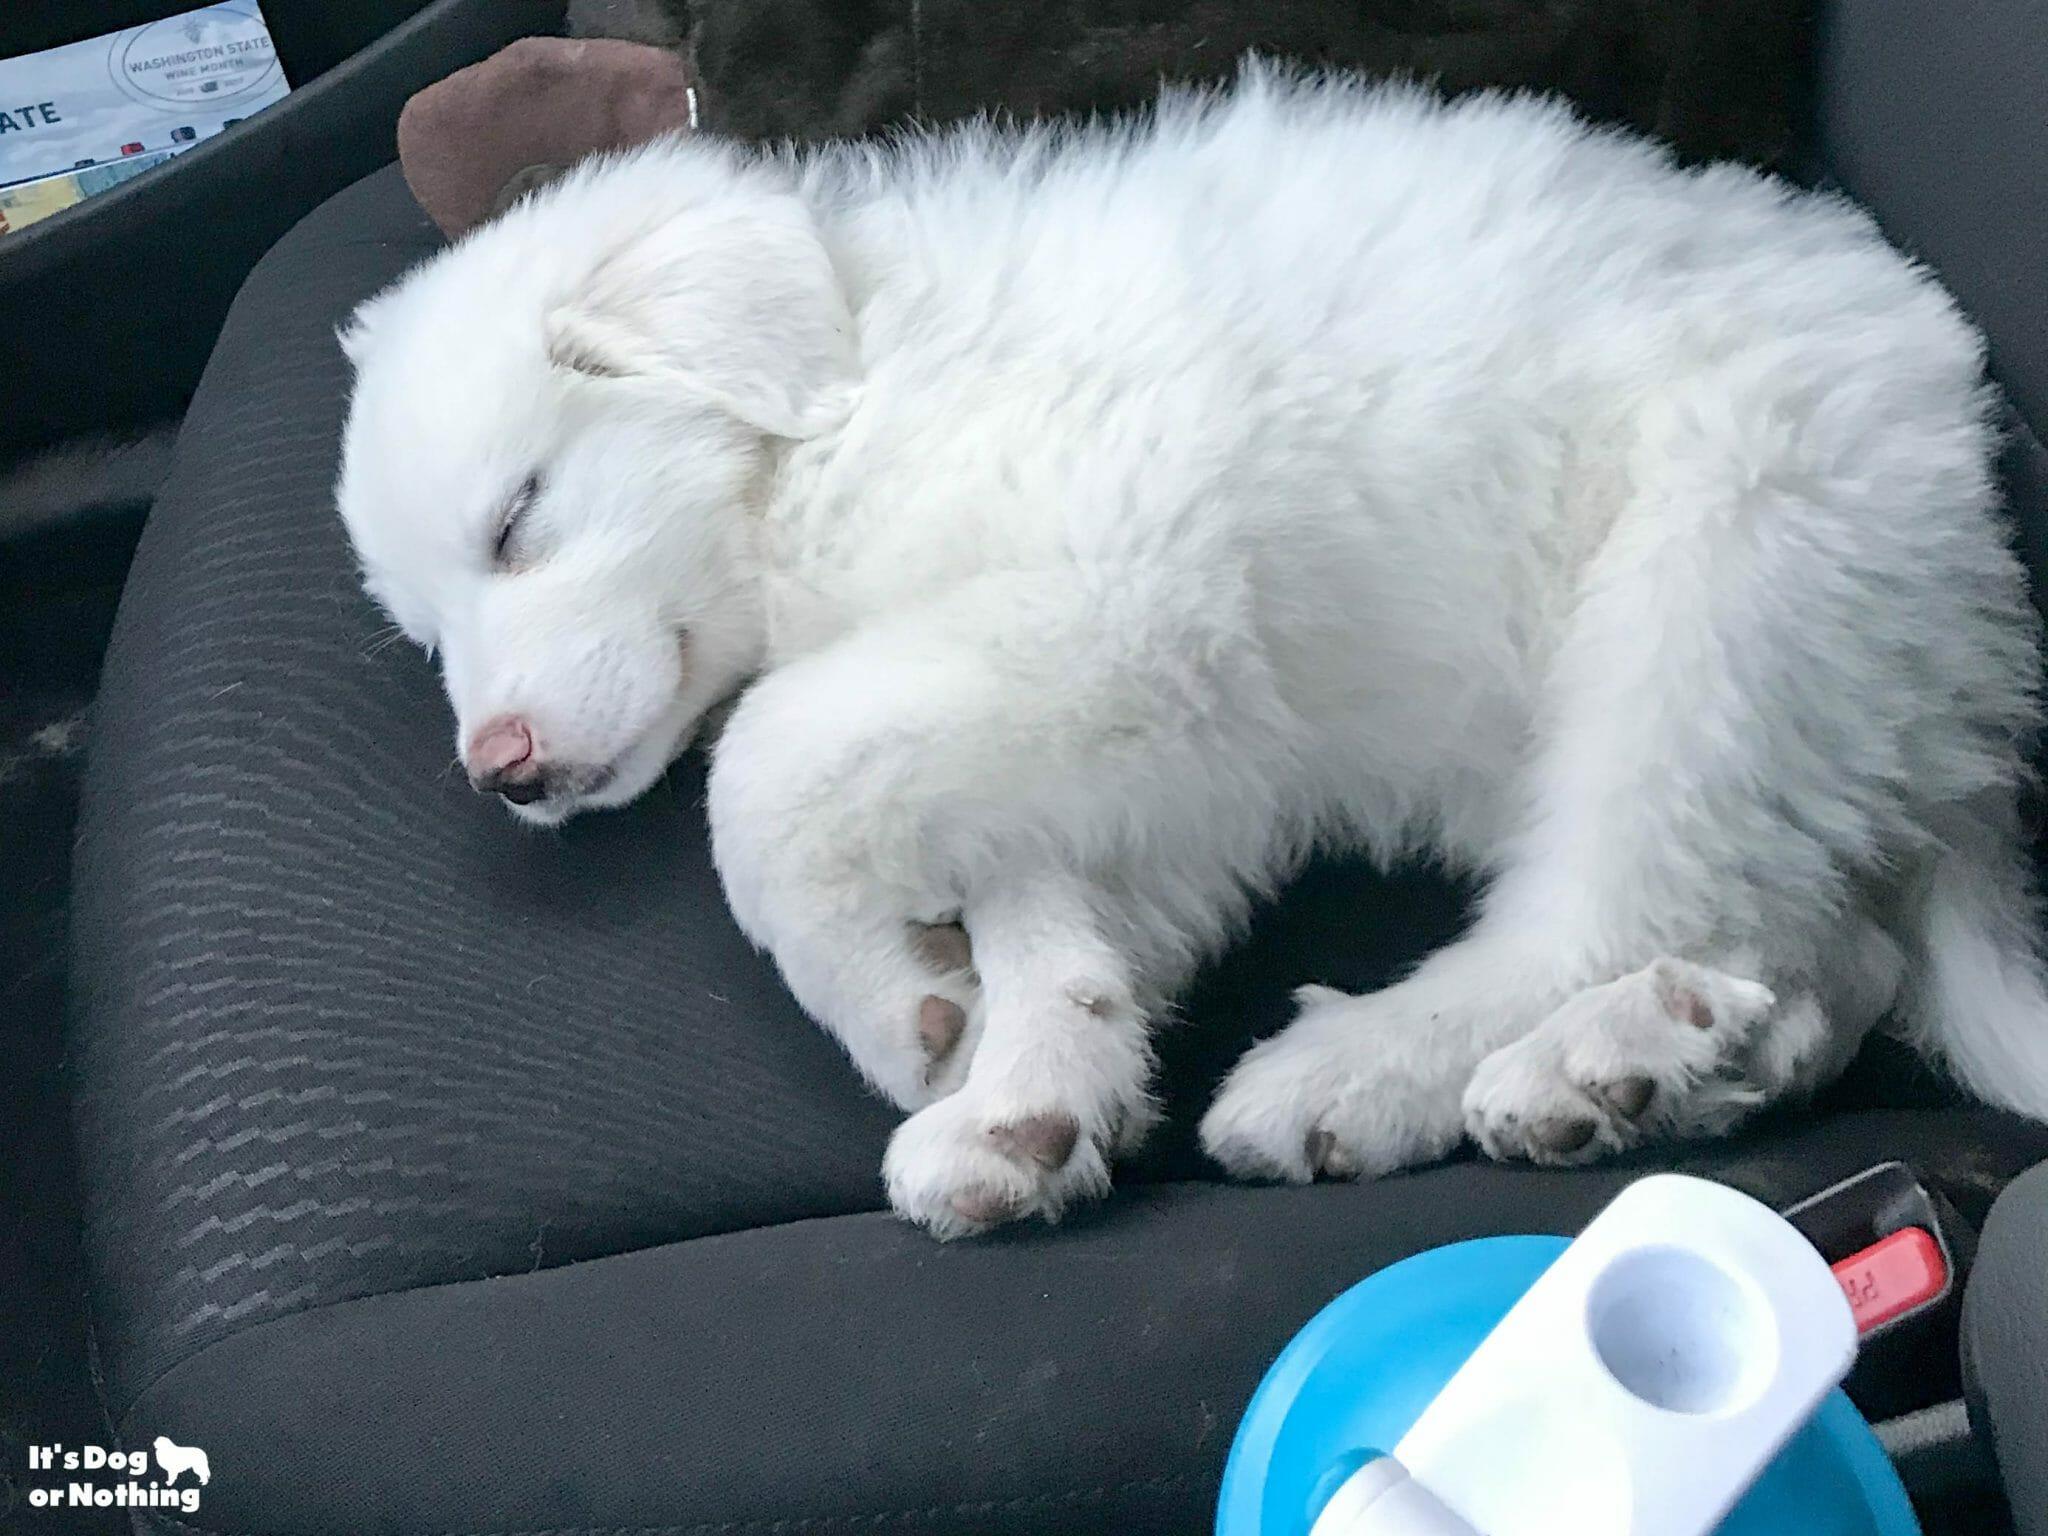 Kiska, our Great Pyrenees puppy, at 8 weeks.